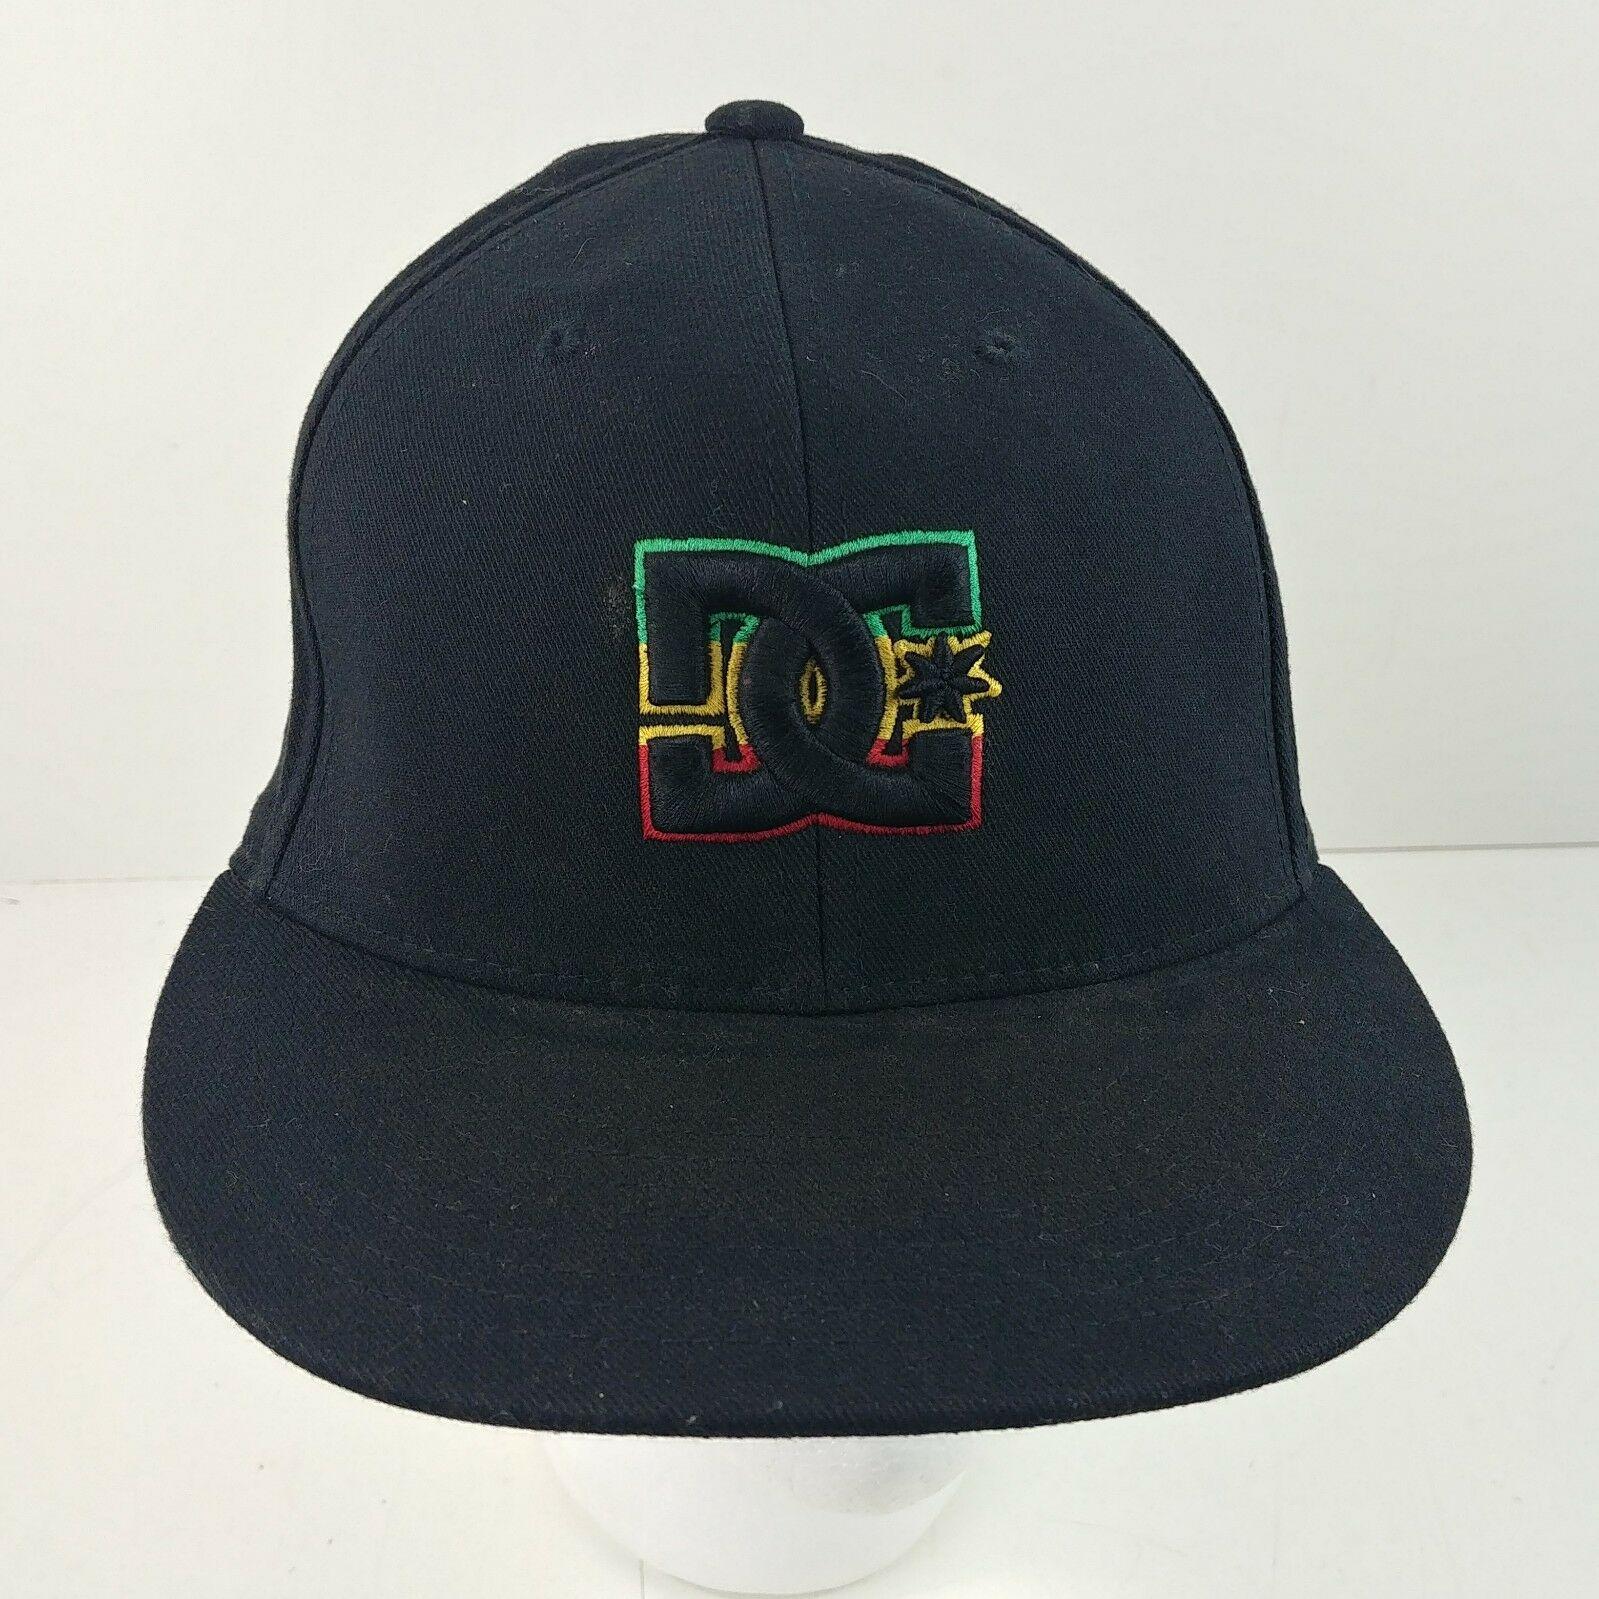 0779b856 Black Rasta DC Shoes 210 Fitted 6-7/8 – 7-1/4 Baseball Snapback Cap Hat – #9